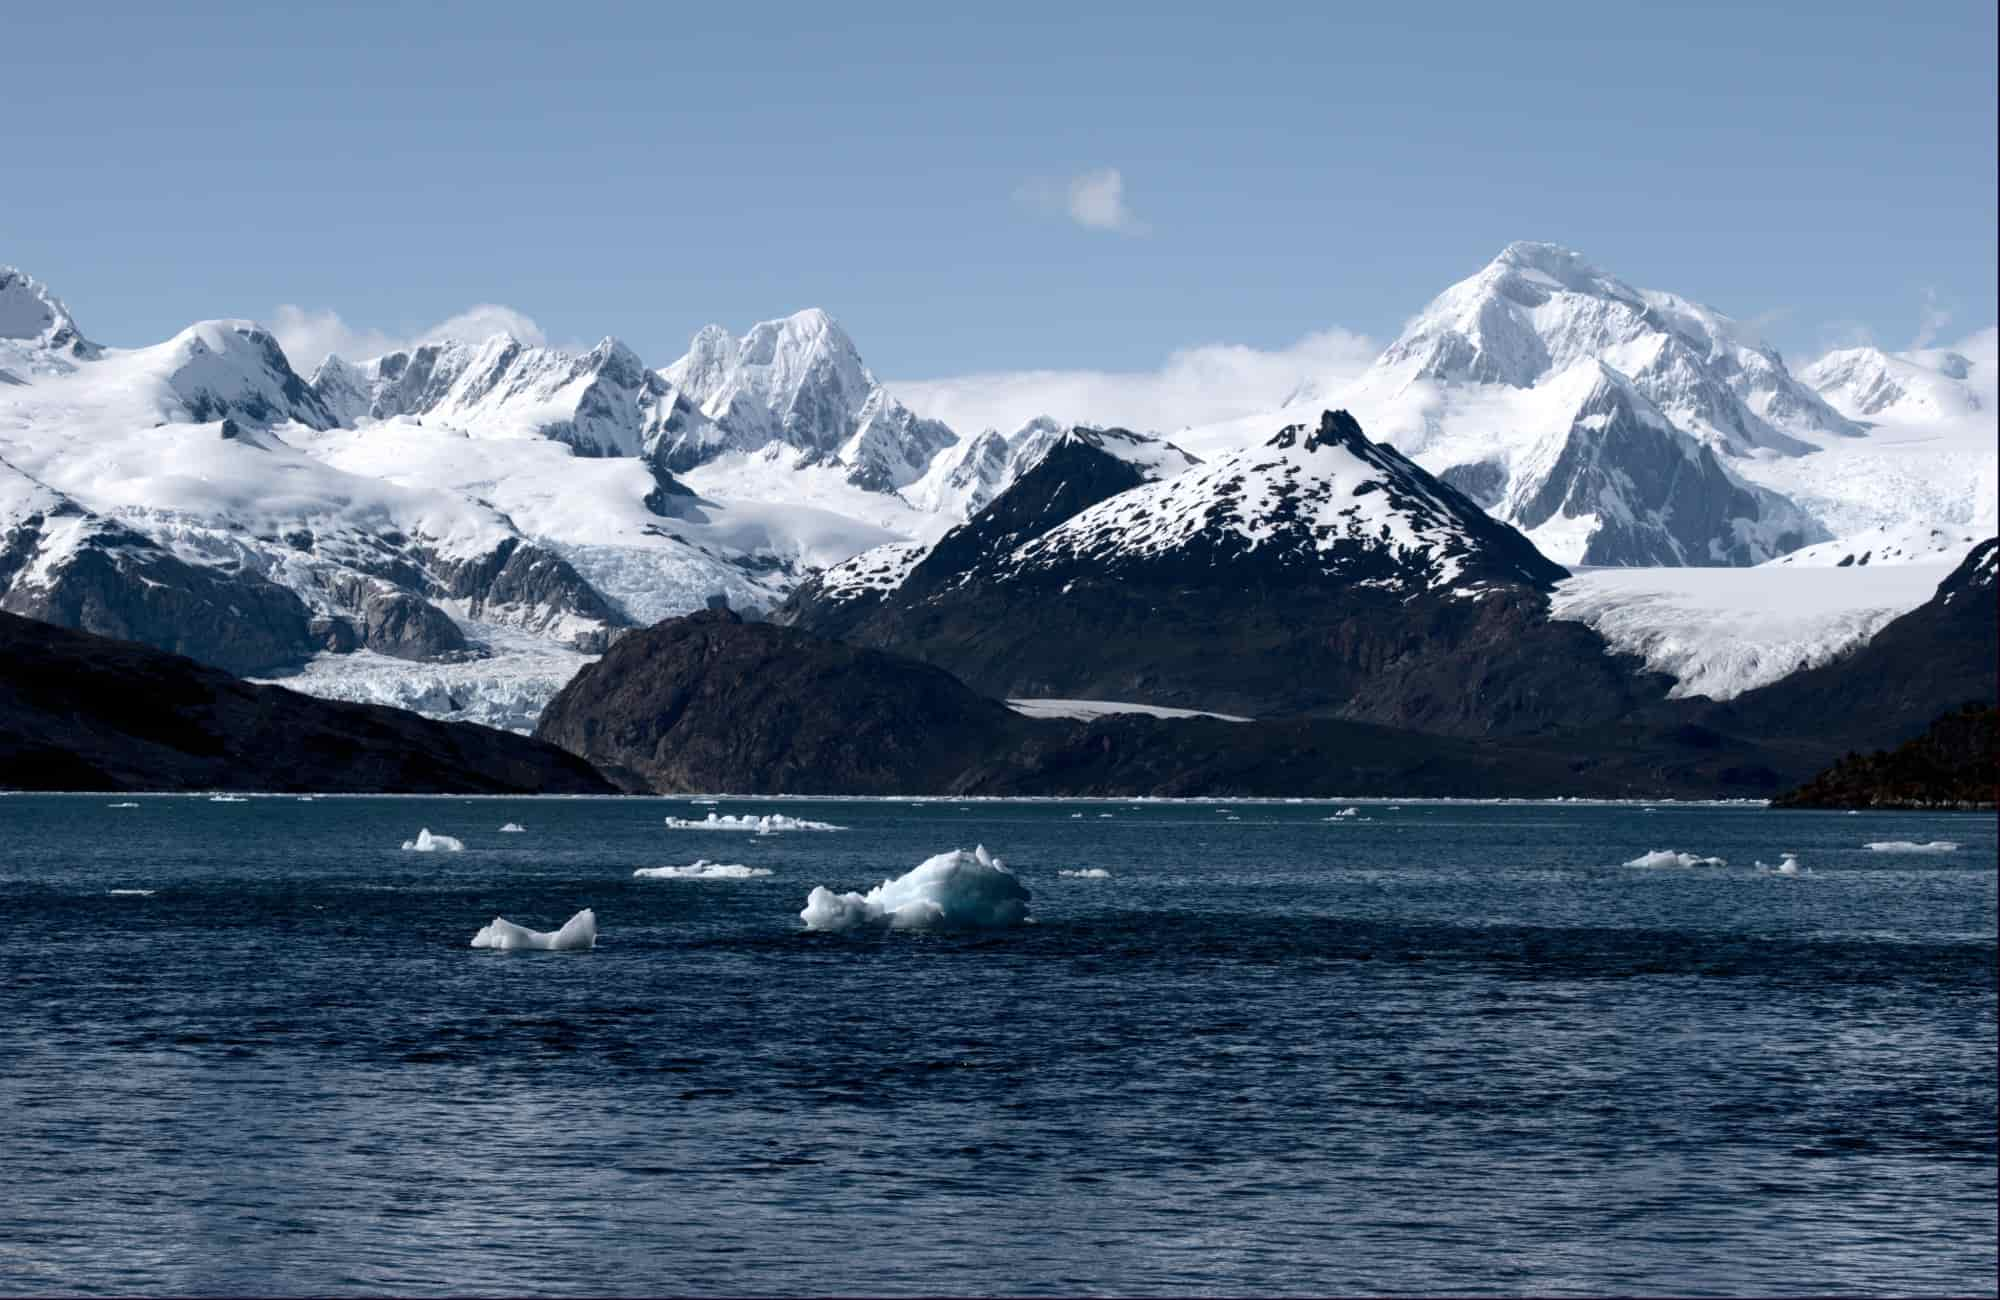 Voyage Cap Horn - Baie Ainsworth Glacier Marinelli - Amplitudes